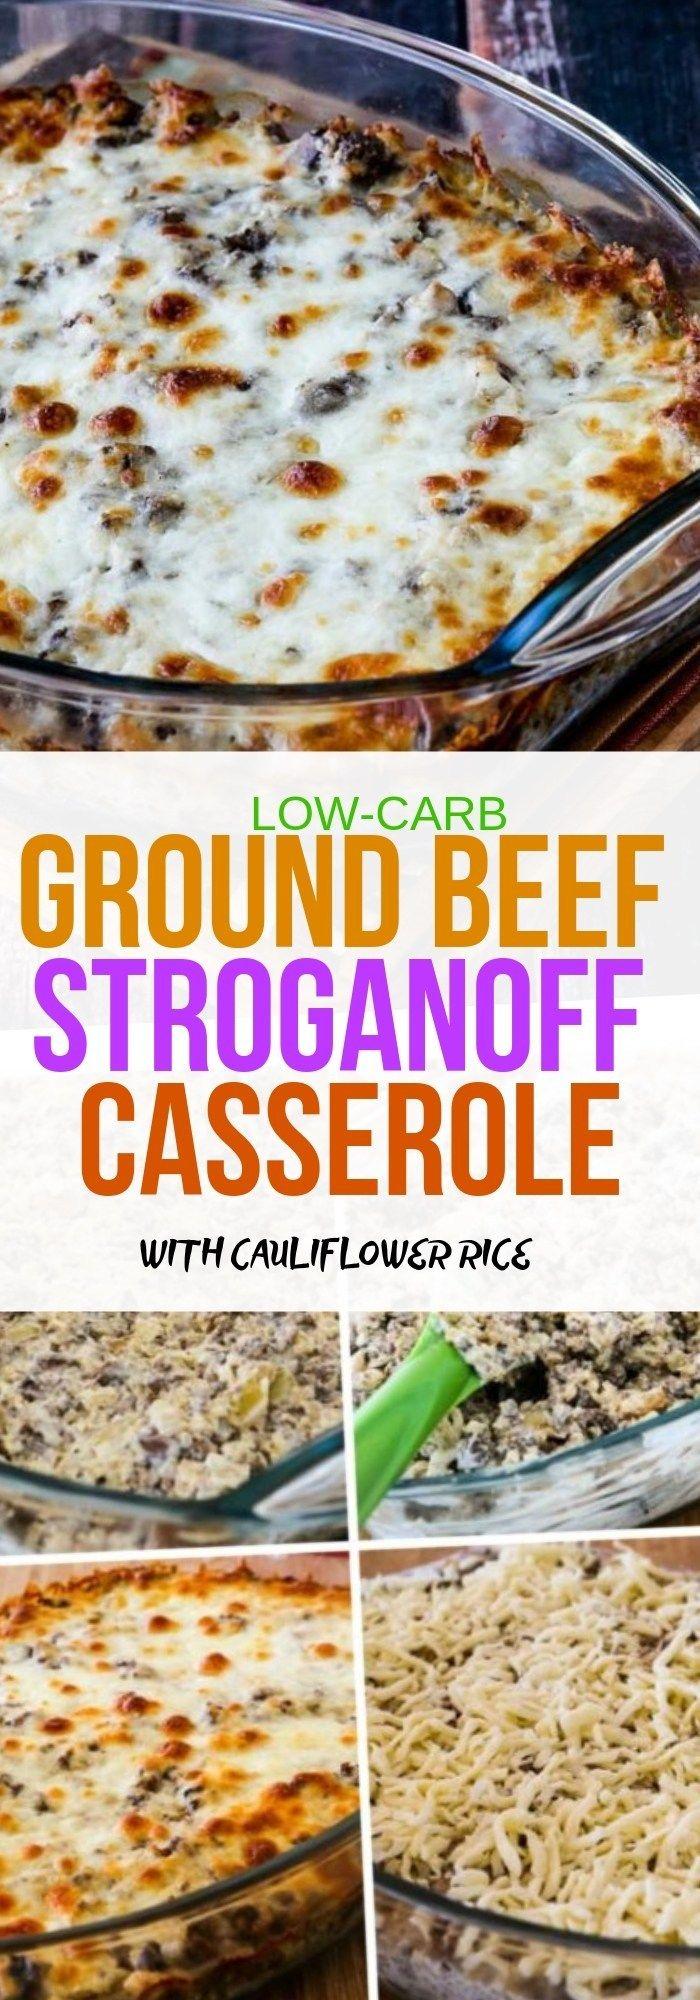 LOW-CARB GROUND BEEF STROGANOFF CASSEROLE WITH CAULIFLOWER RICE – Net Feed Daily #beefandrice